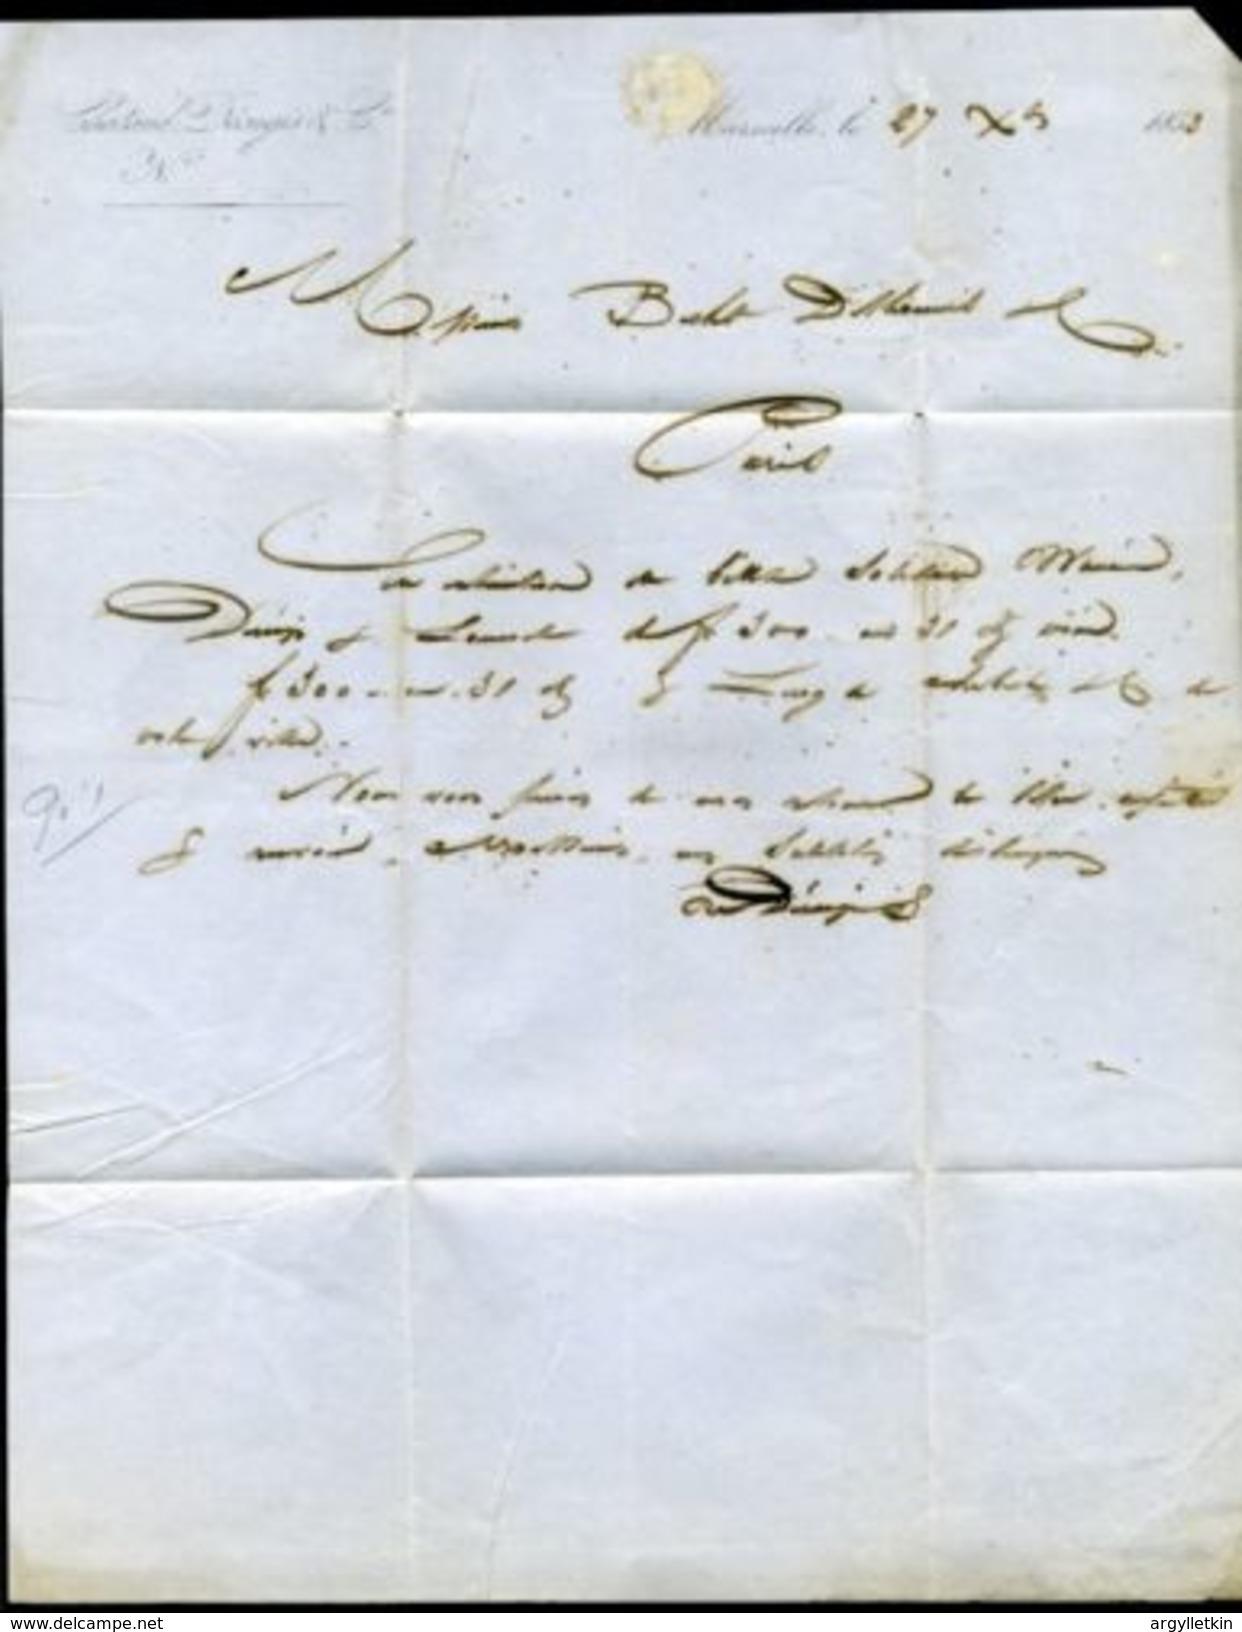 FRANCE PARIS 'RETARD DU CONVI' POSTMARK 1857 - Europe (Other)